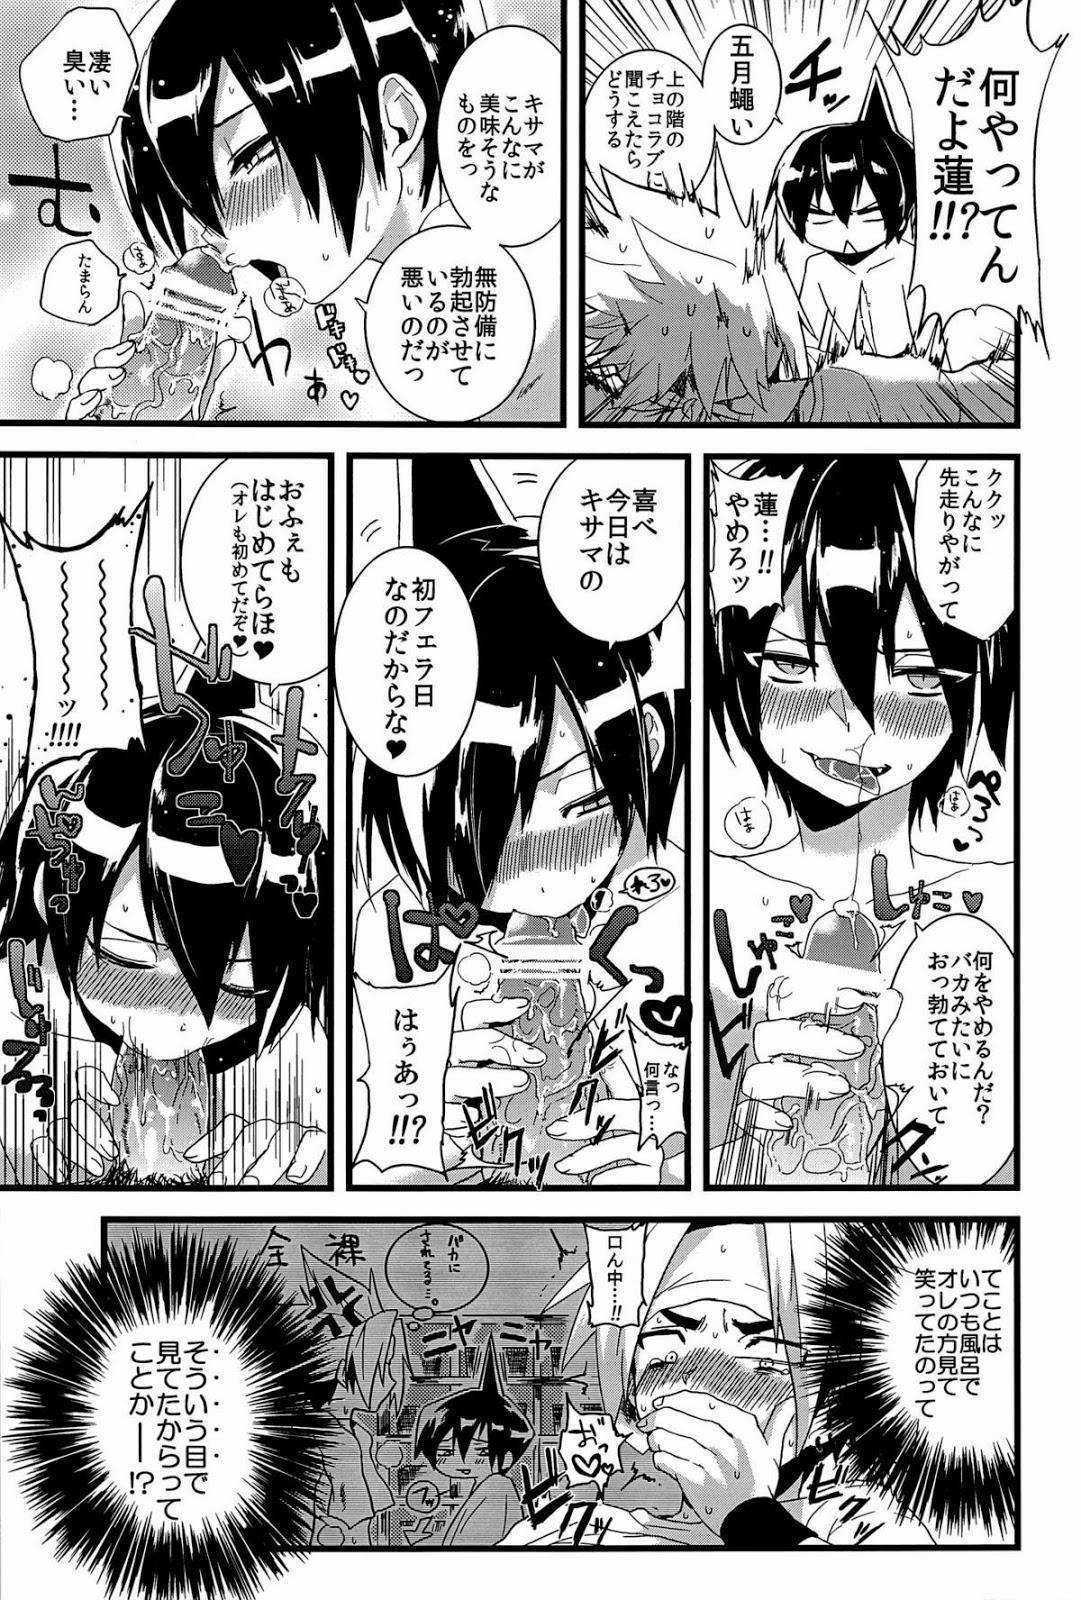 Kisama no Hajimete Ore no Mono! 4